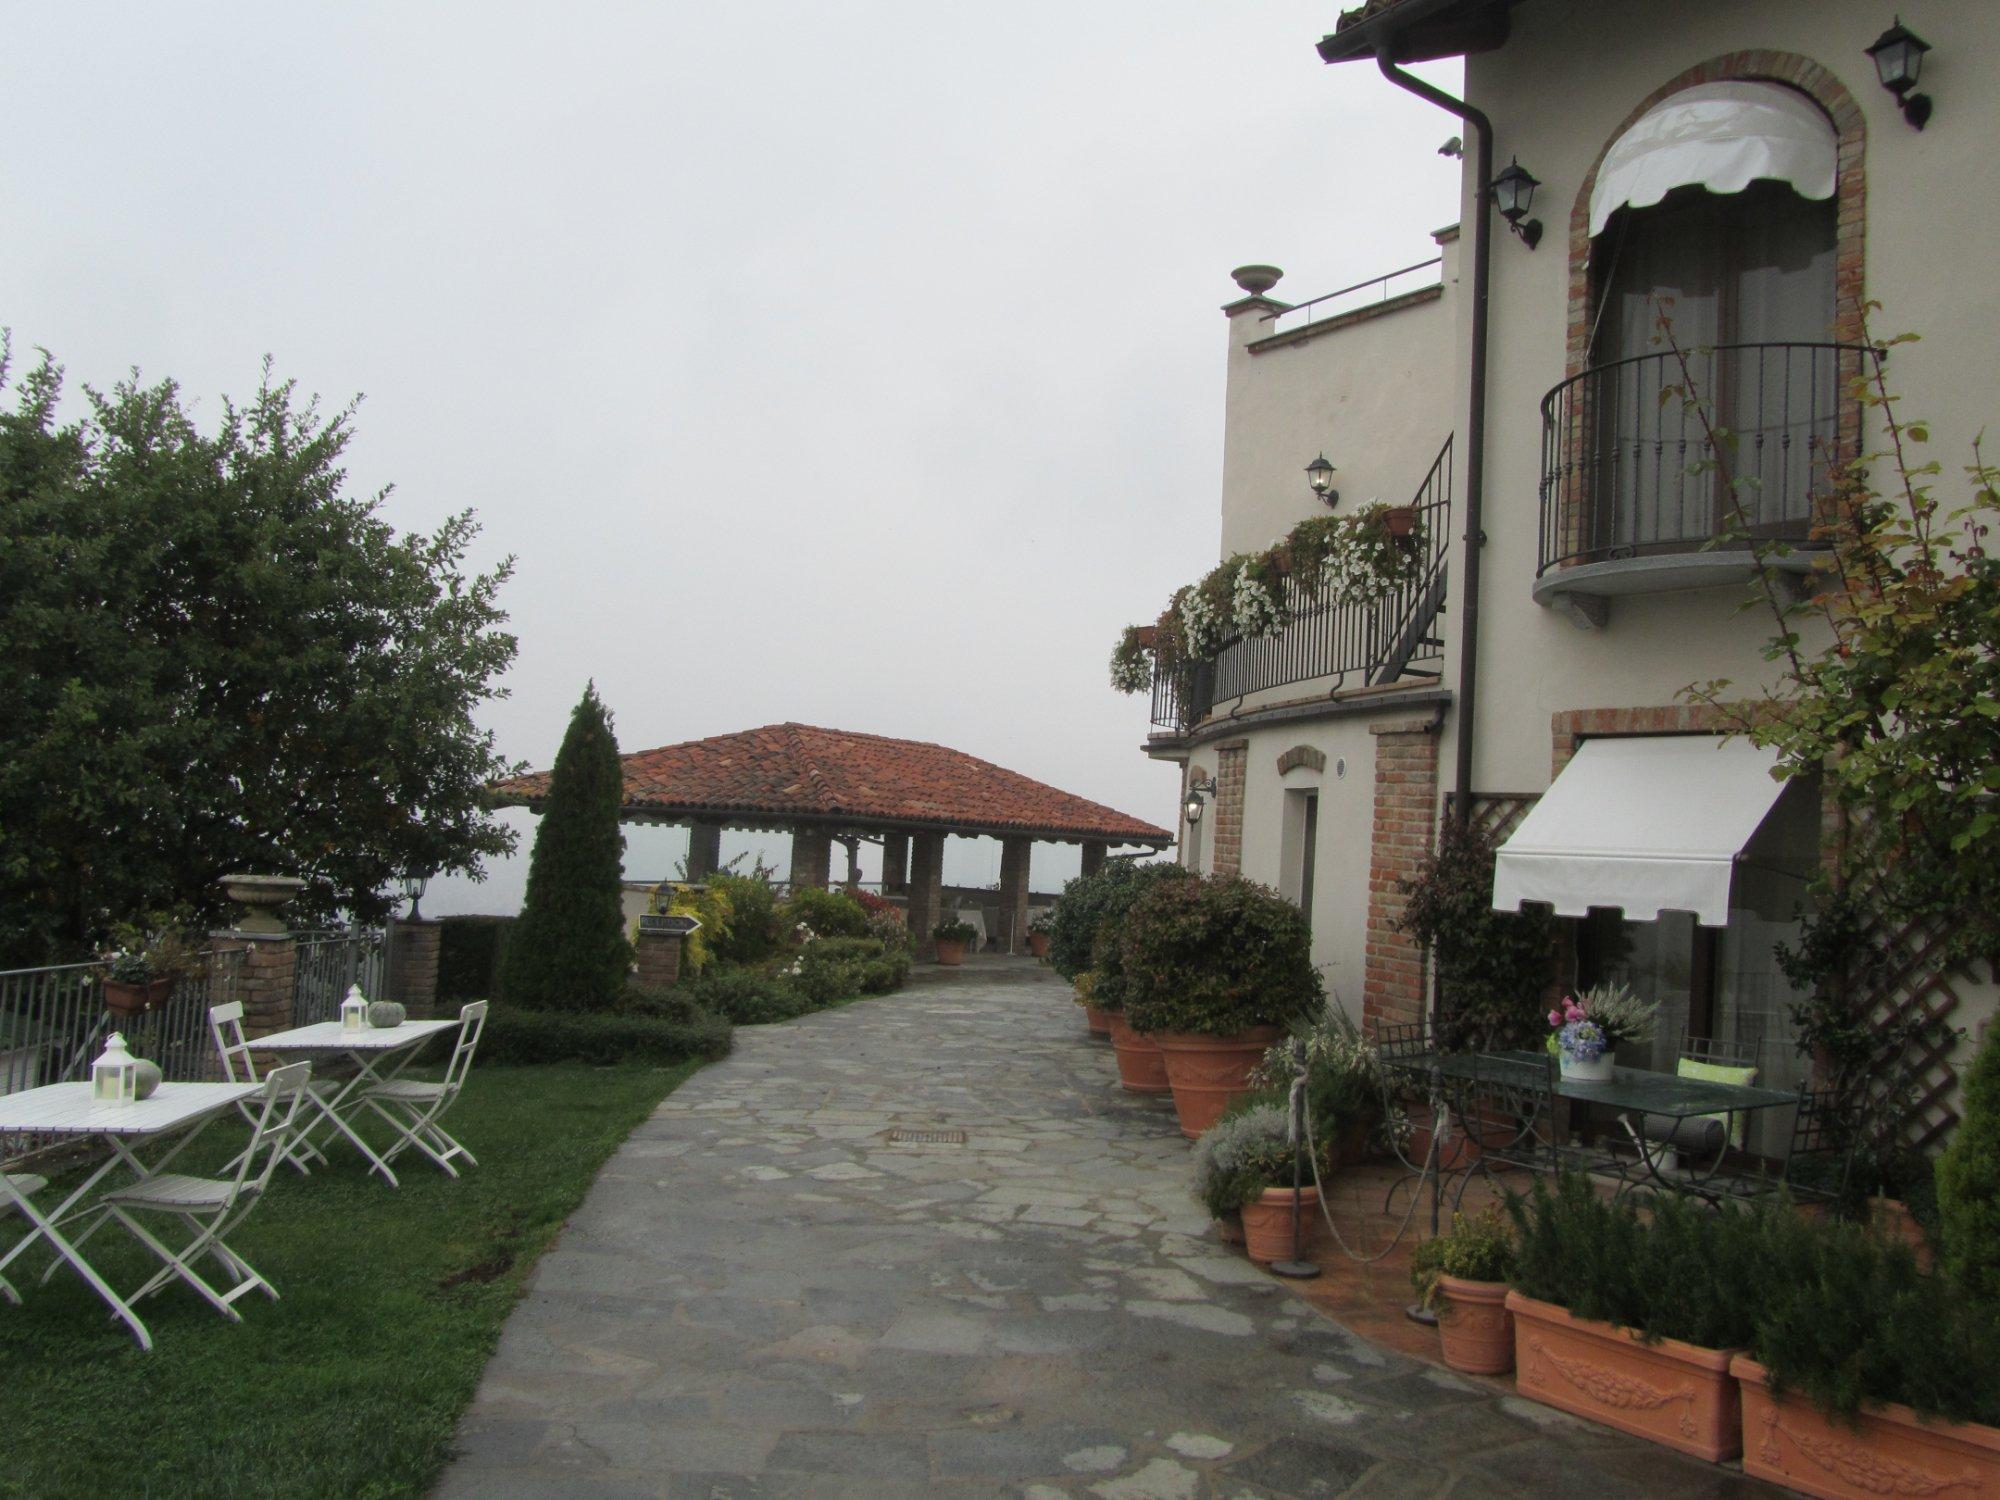 Locanda San Giorgio